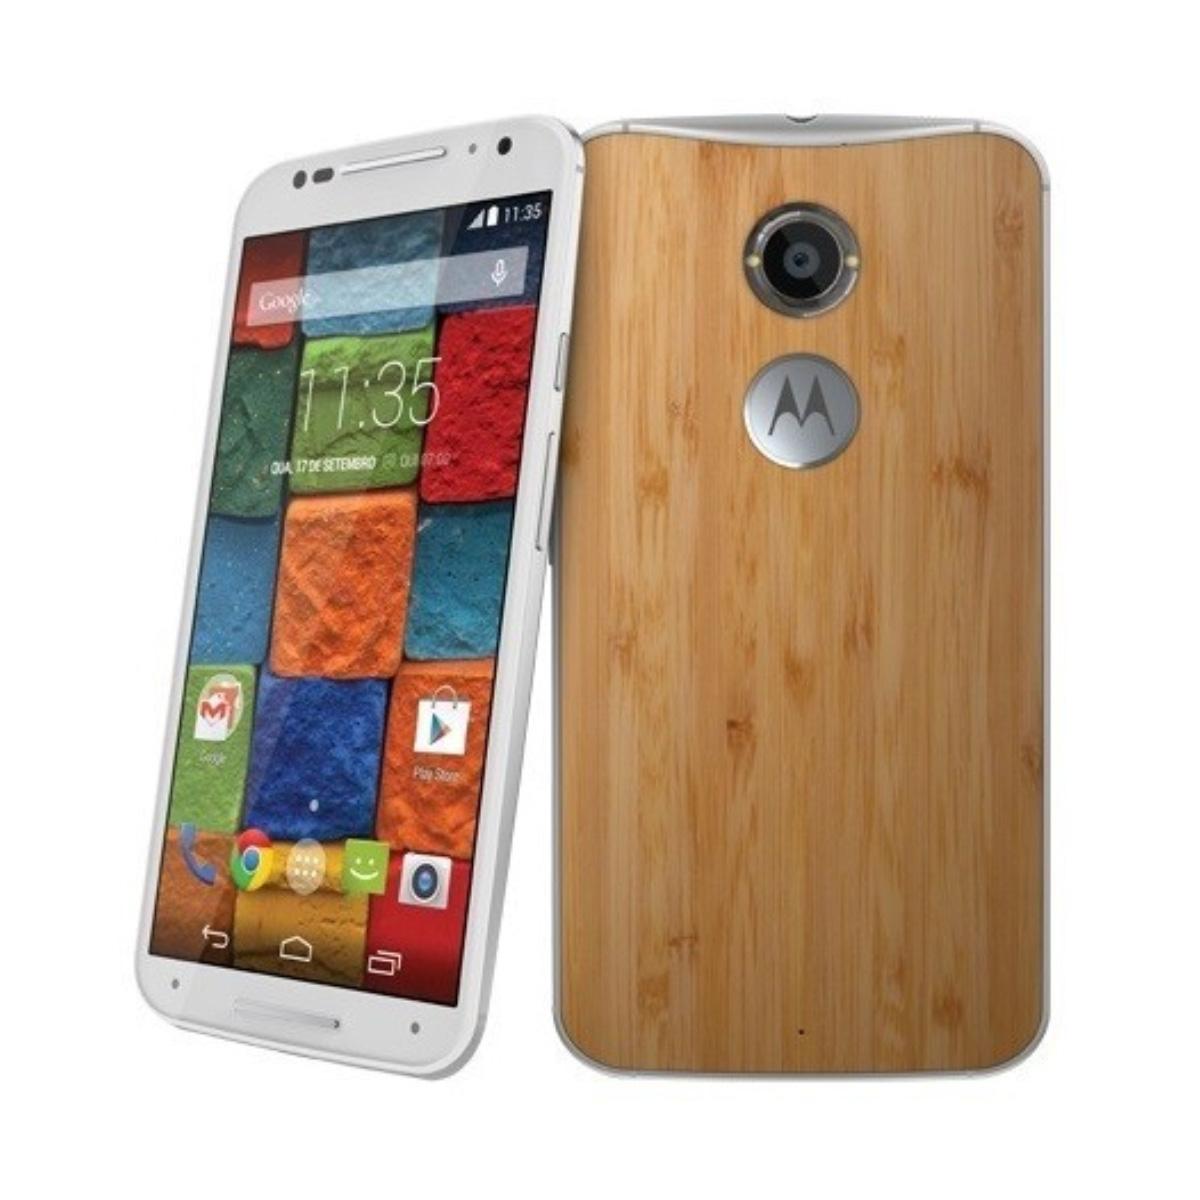 Motorola Moto X2 XT1097 32GB 5.2' 13MP - Recondicionado